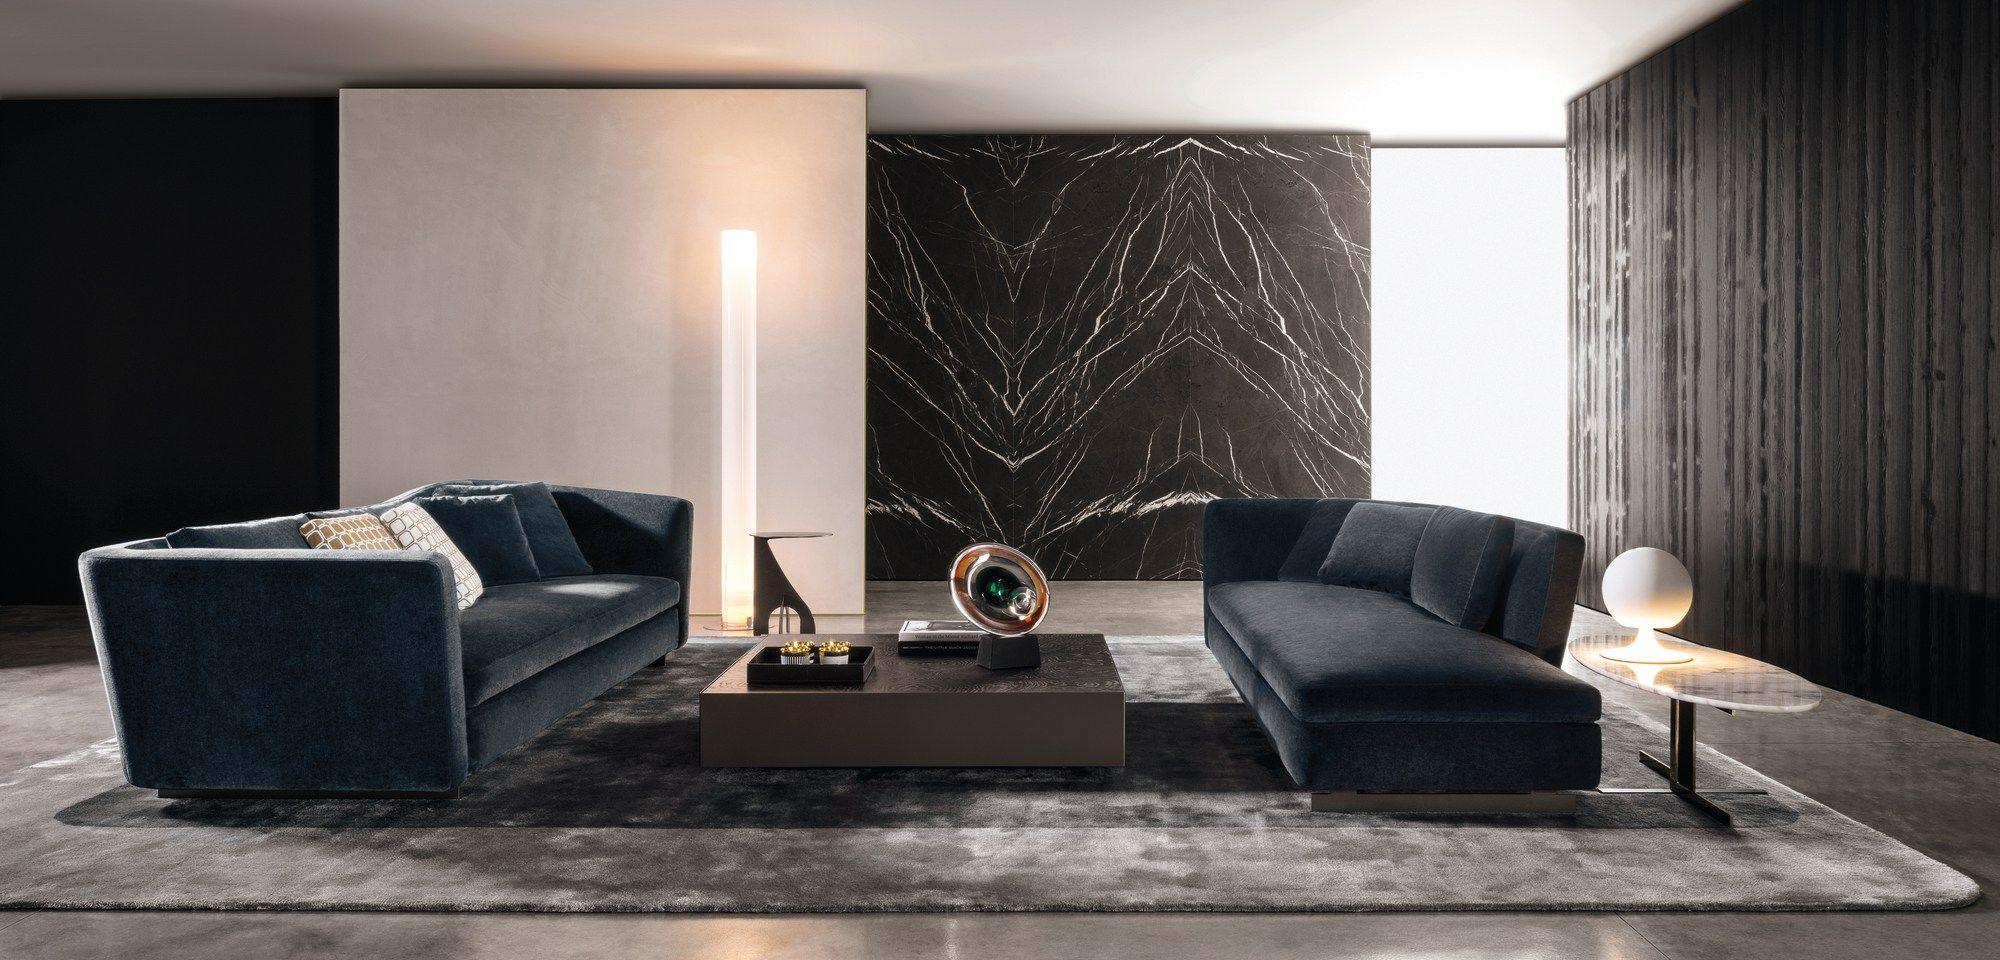 img edilportale products SEYMOUR Round sofa Minotti